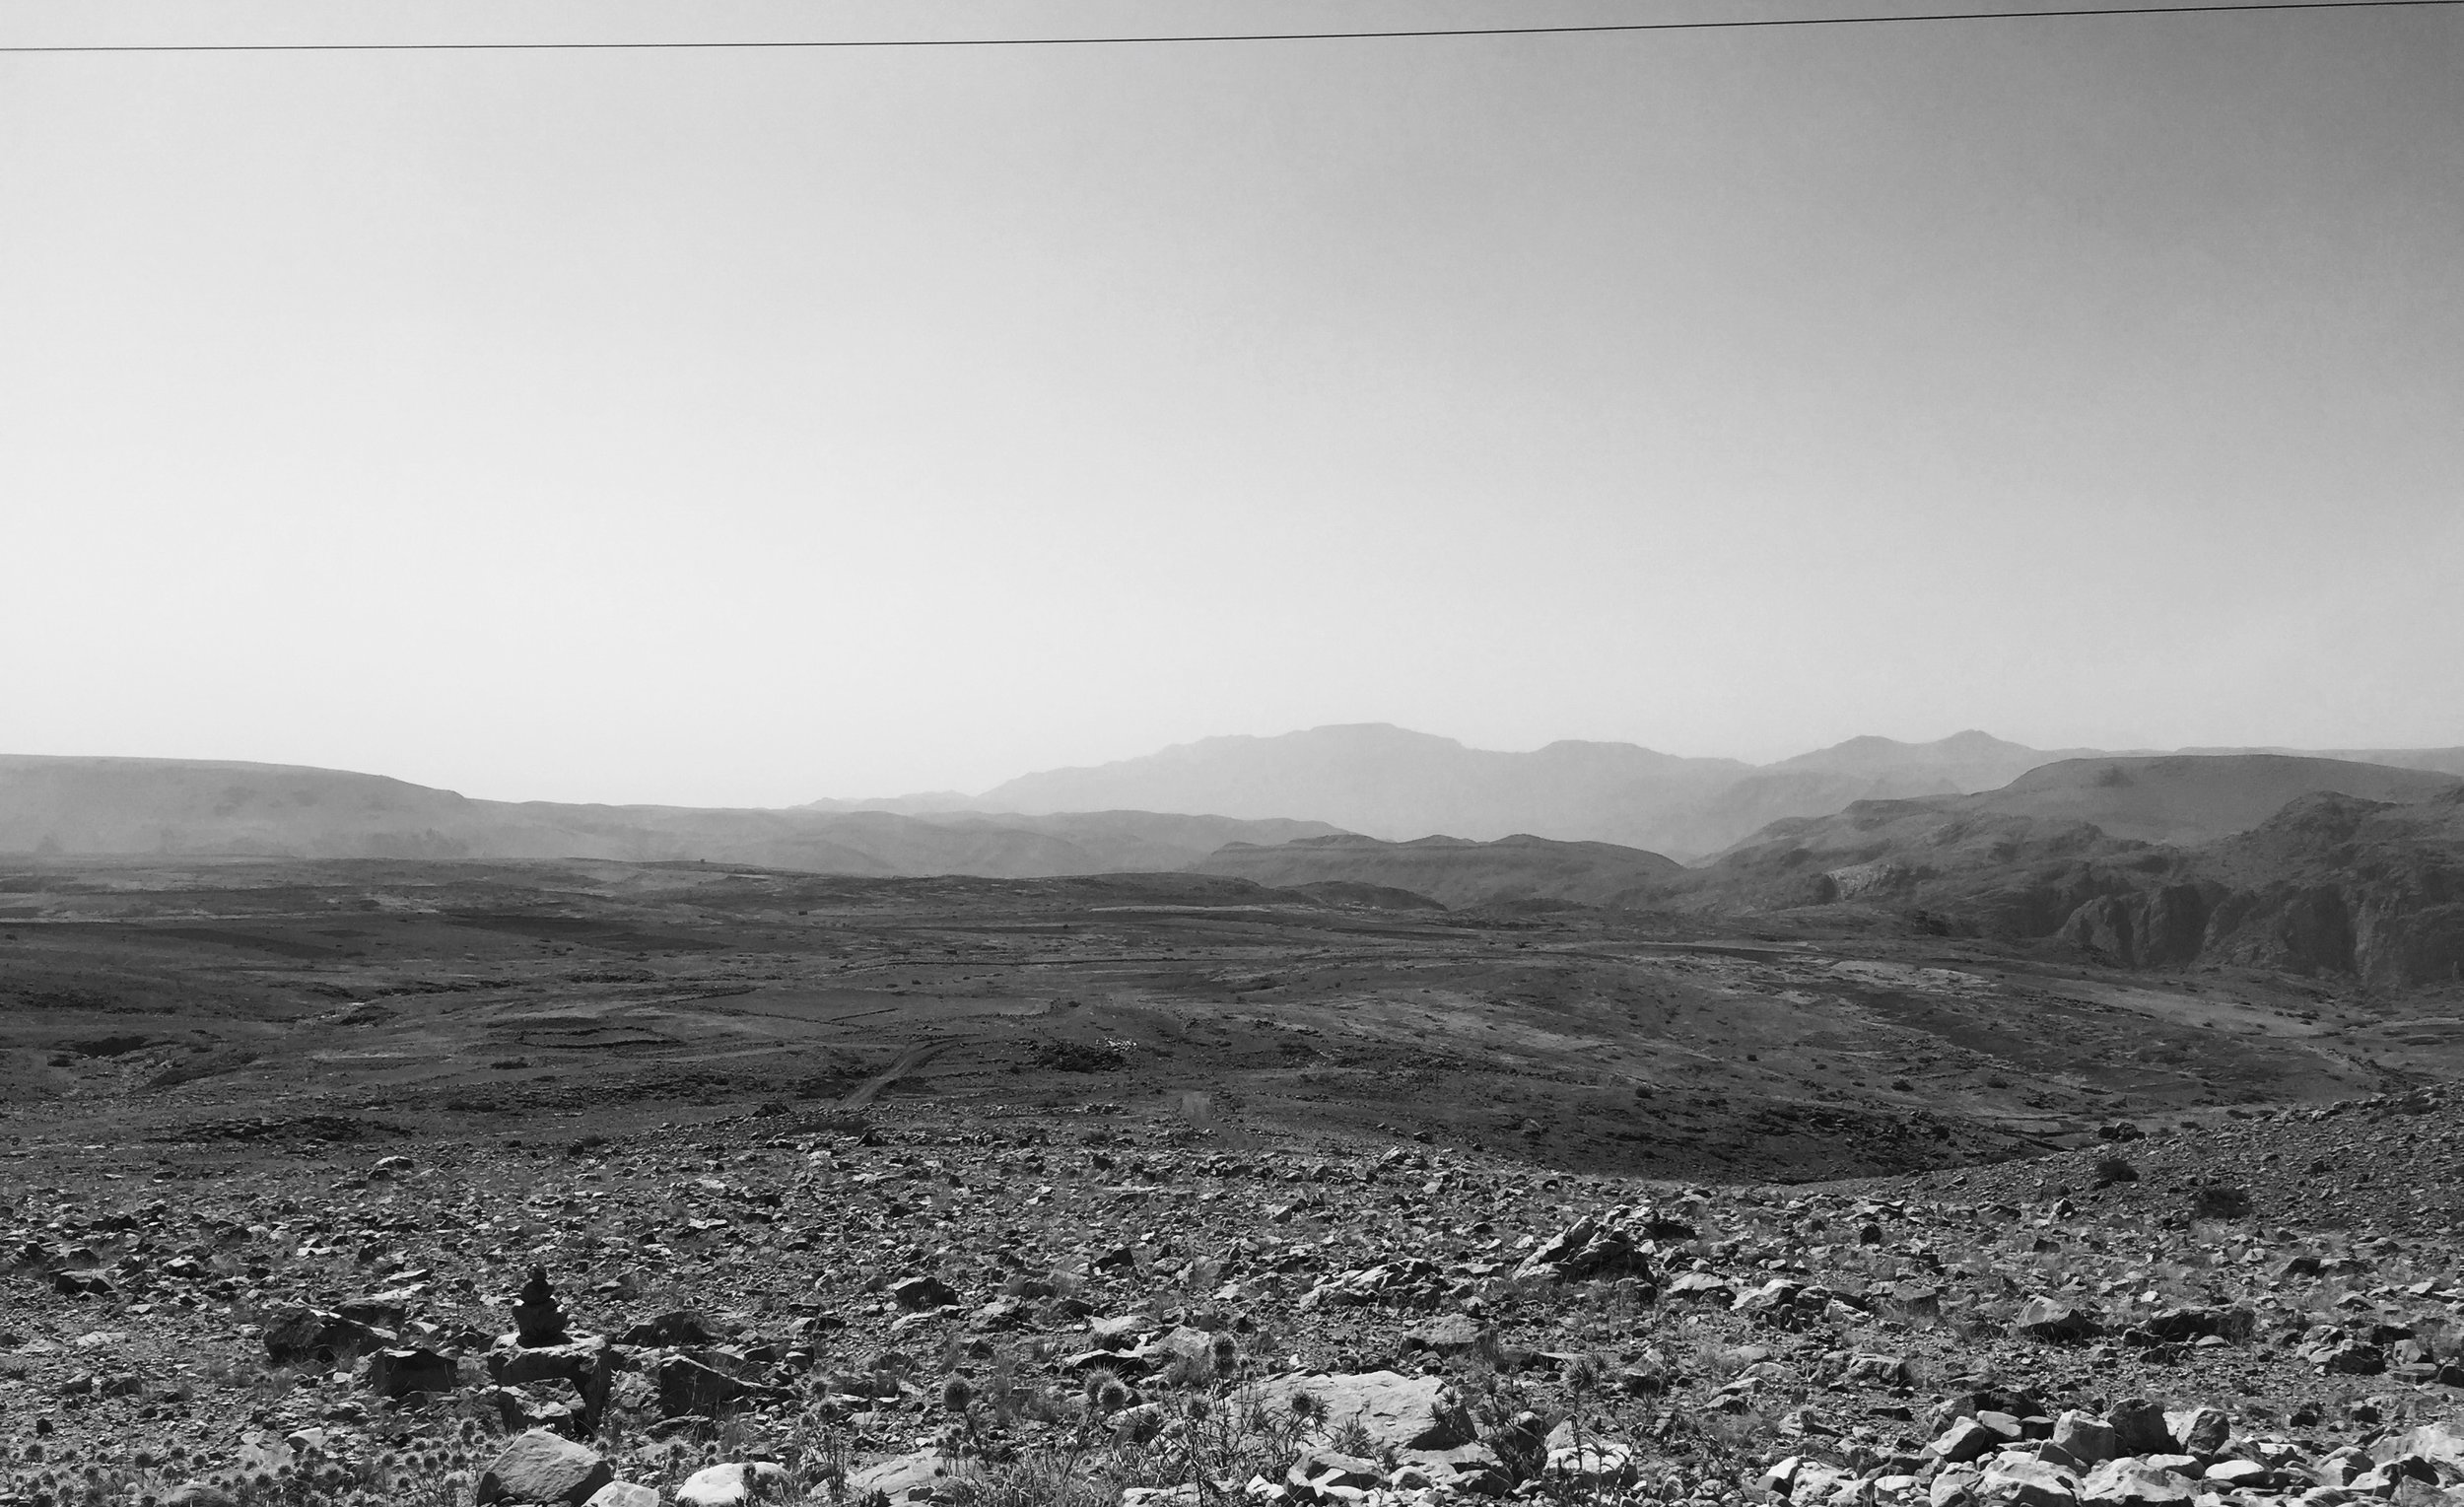 Morocco II - On the Road